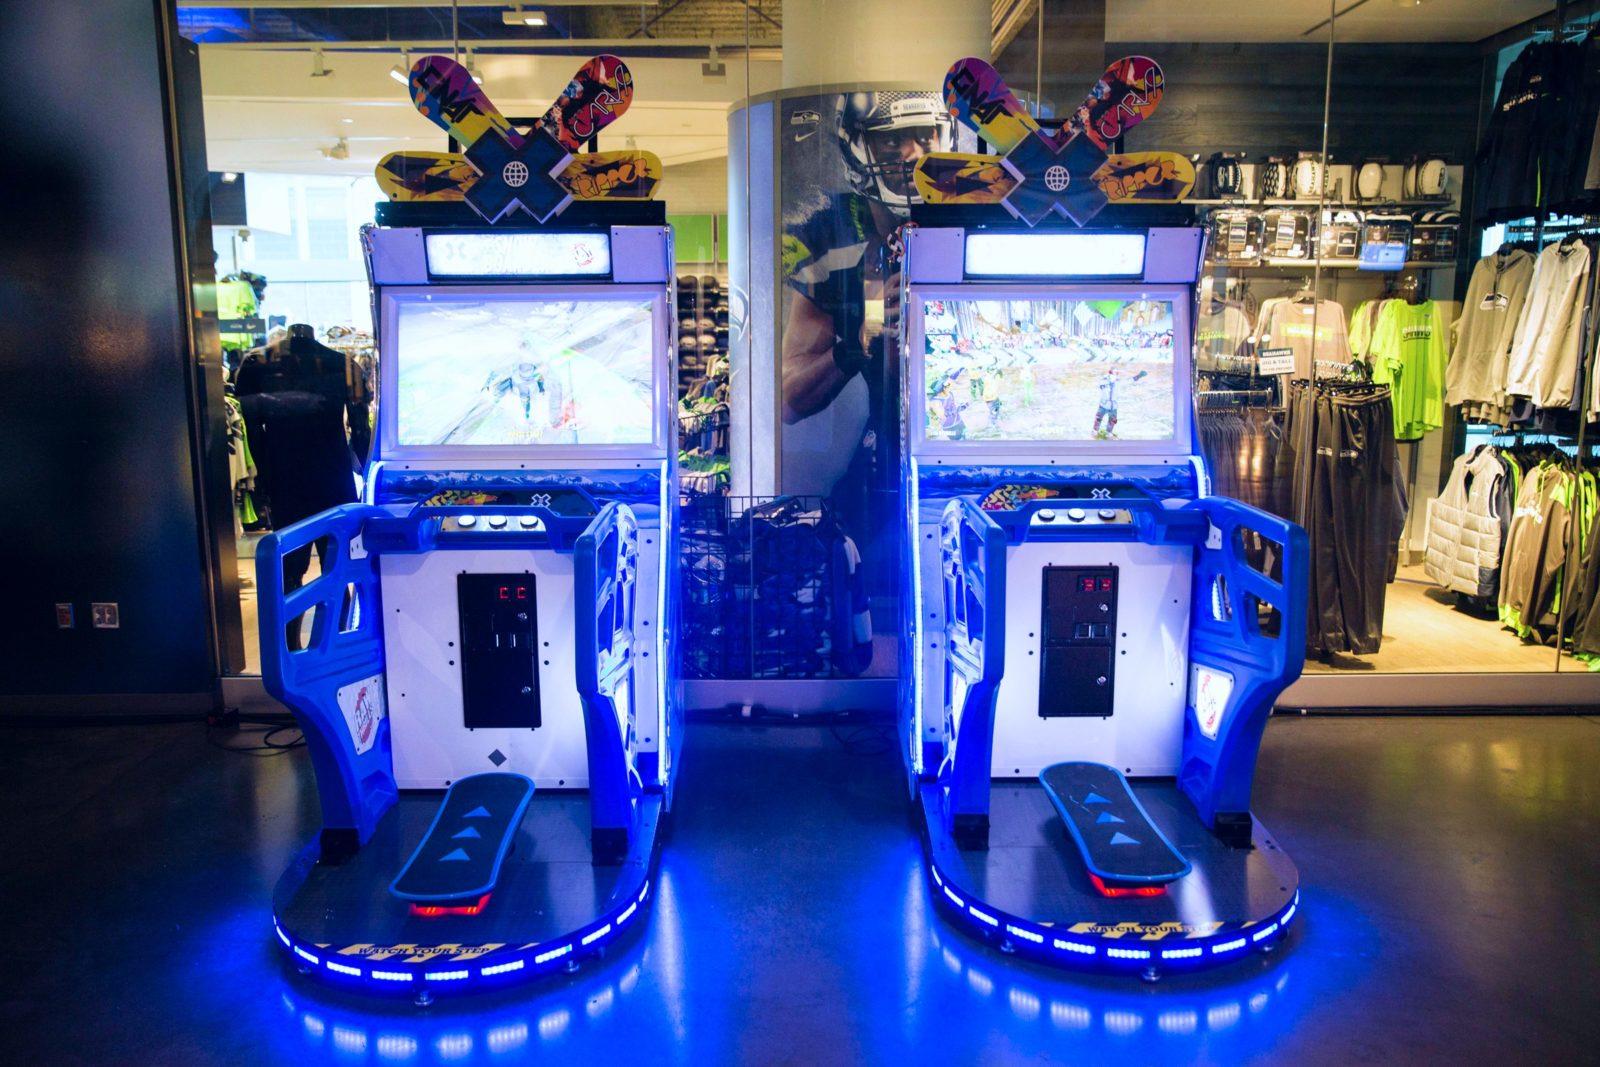 Snowboarding Arcade Game